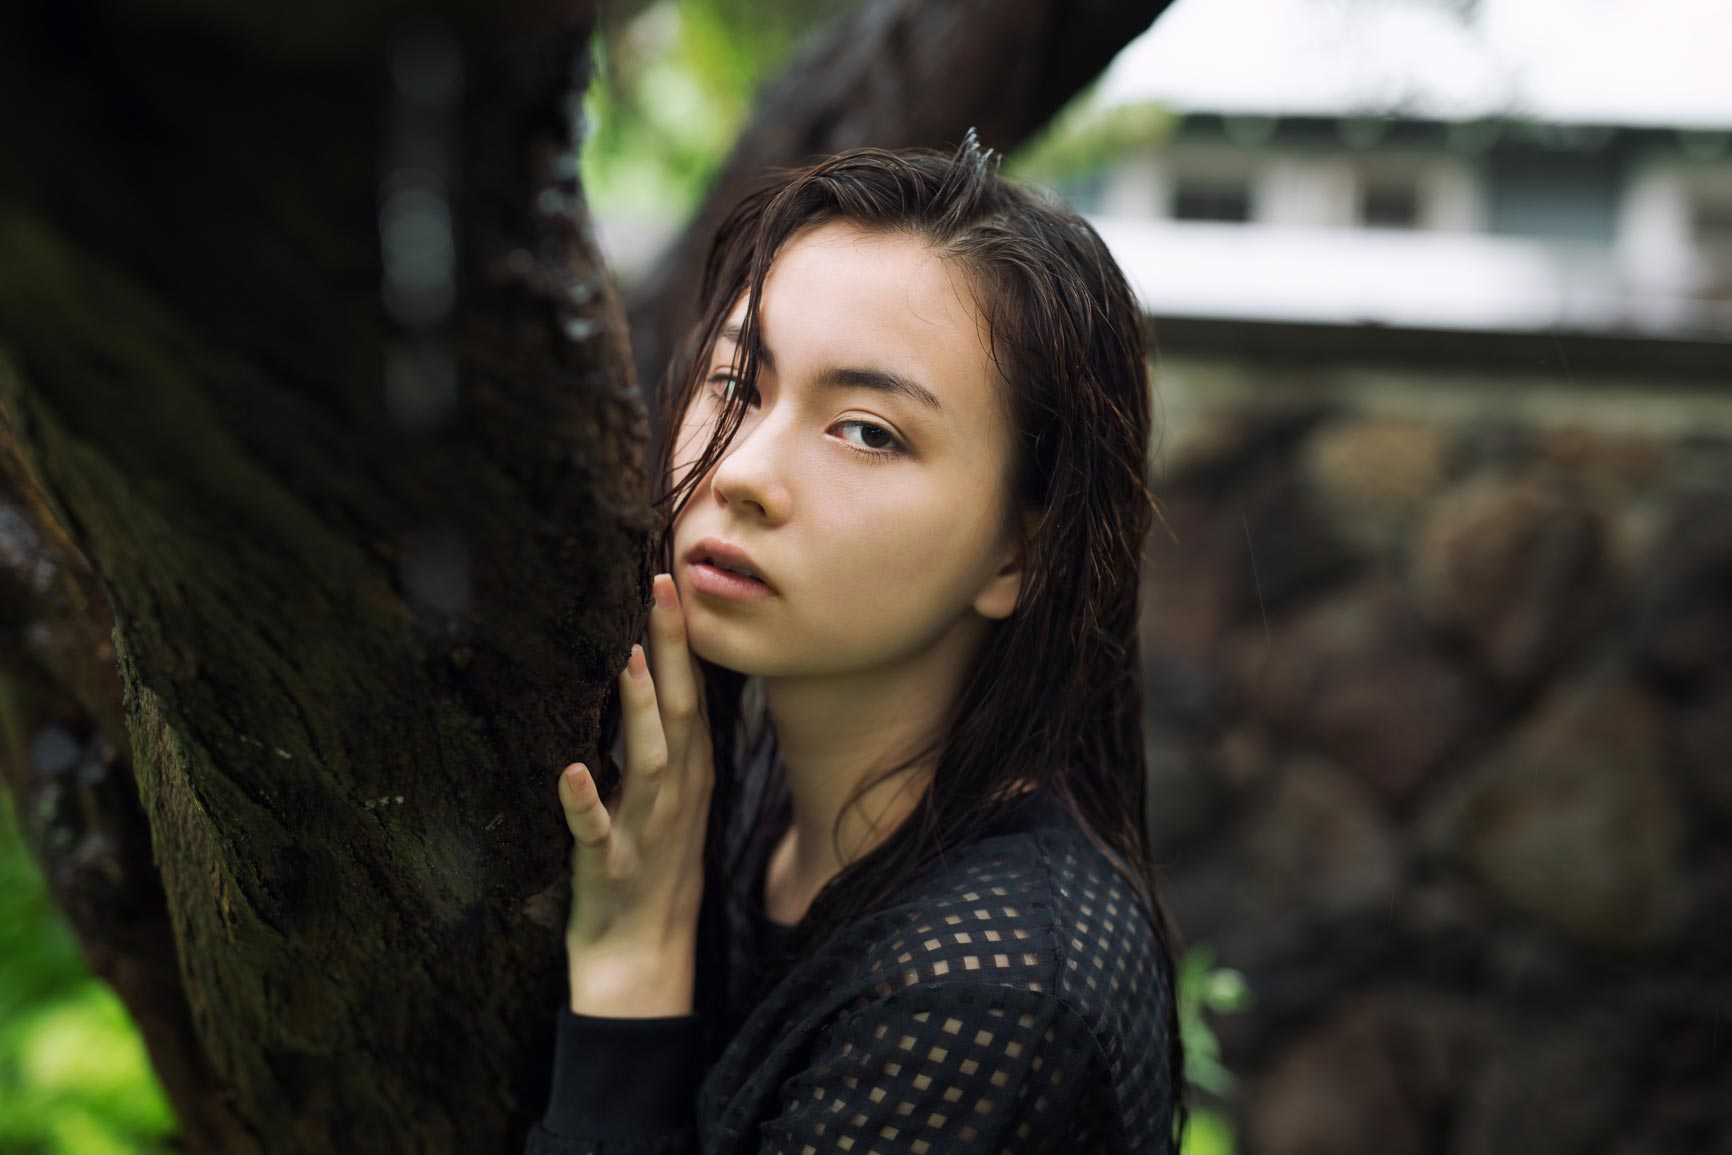 Hanel-Choi-Photography--Lauren-Tsai-19